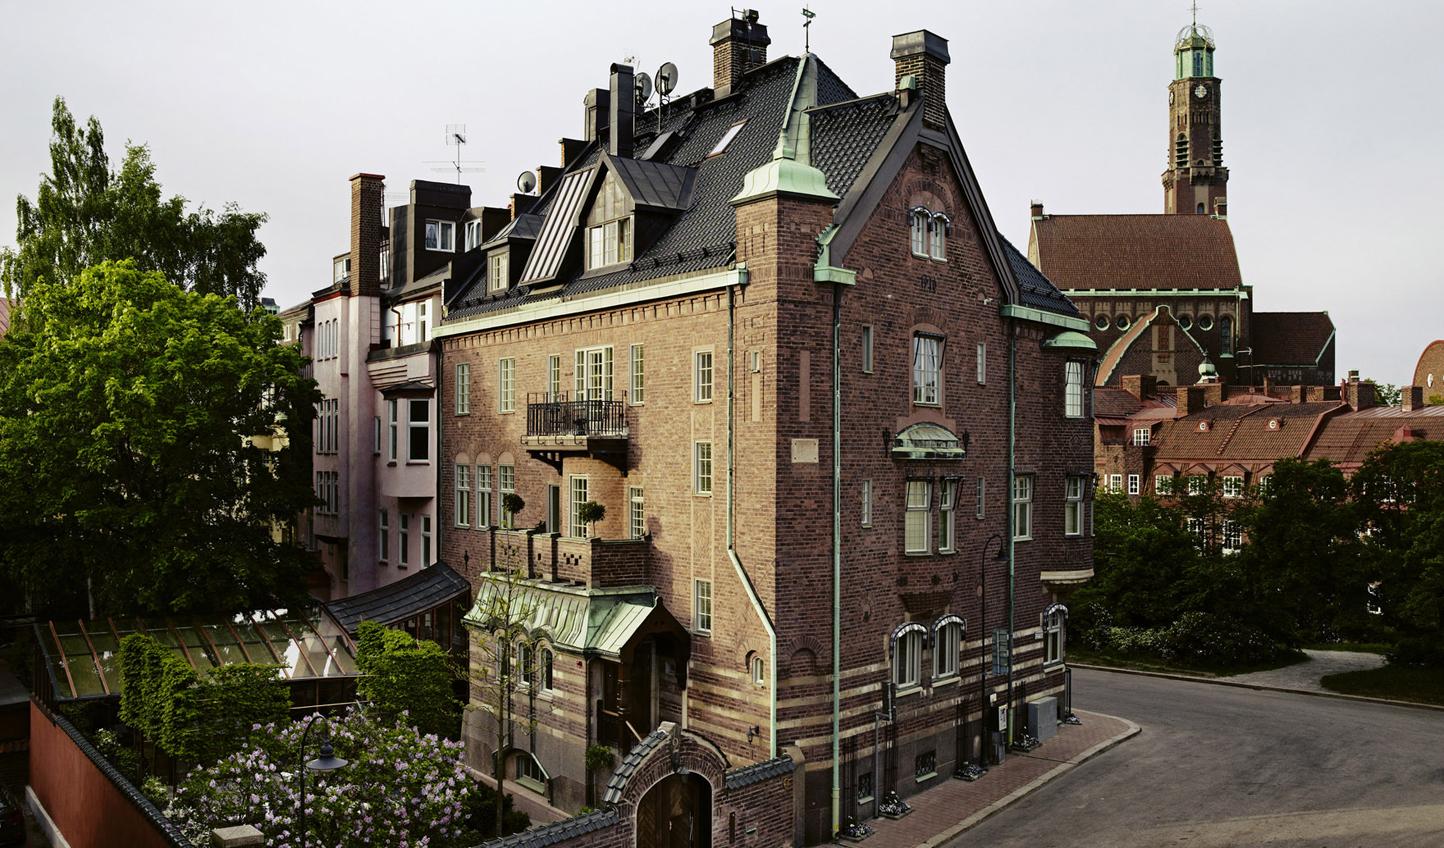 Ett Hem - the townhouse dates back to 1910.